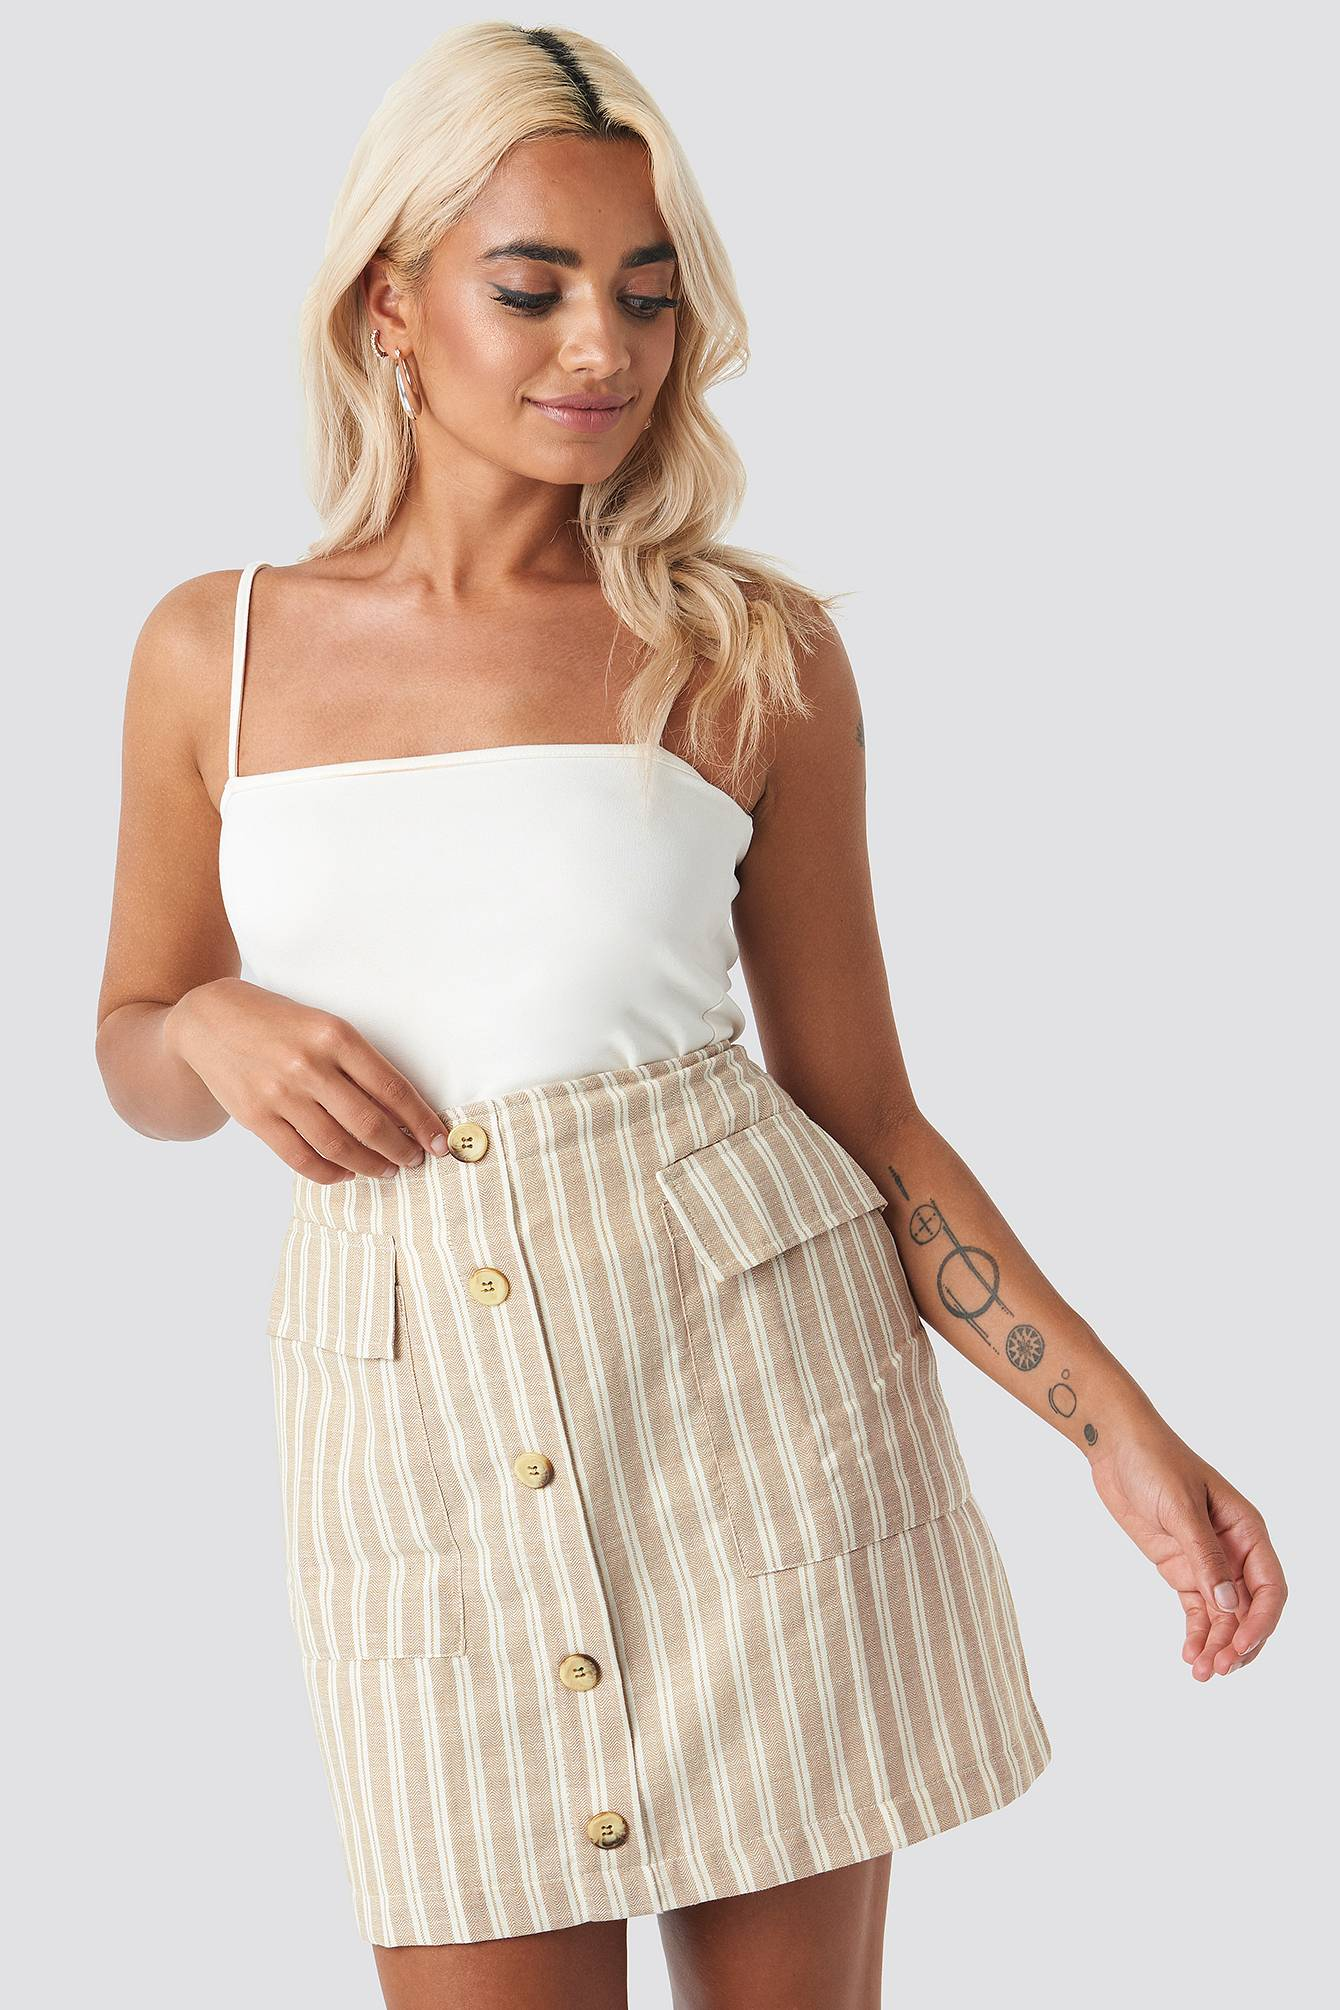 Trendyol Striped Mini Skirt - Beige